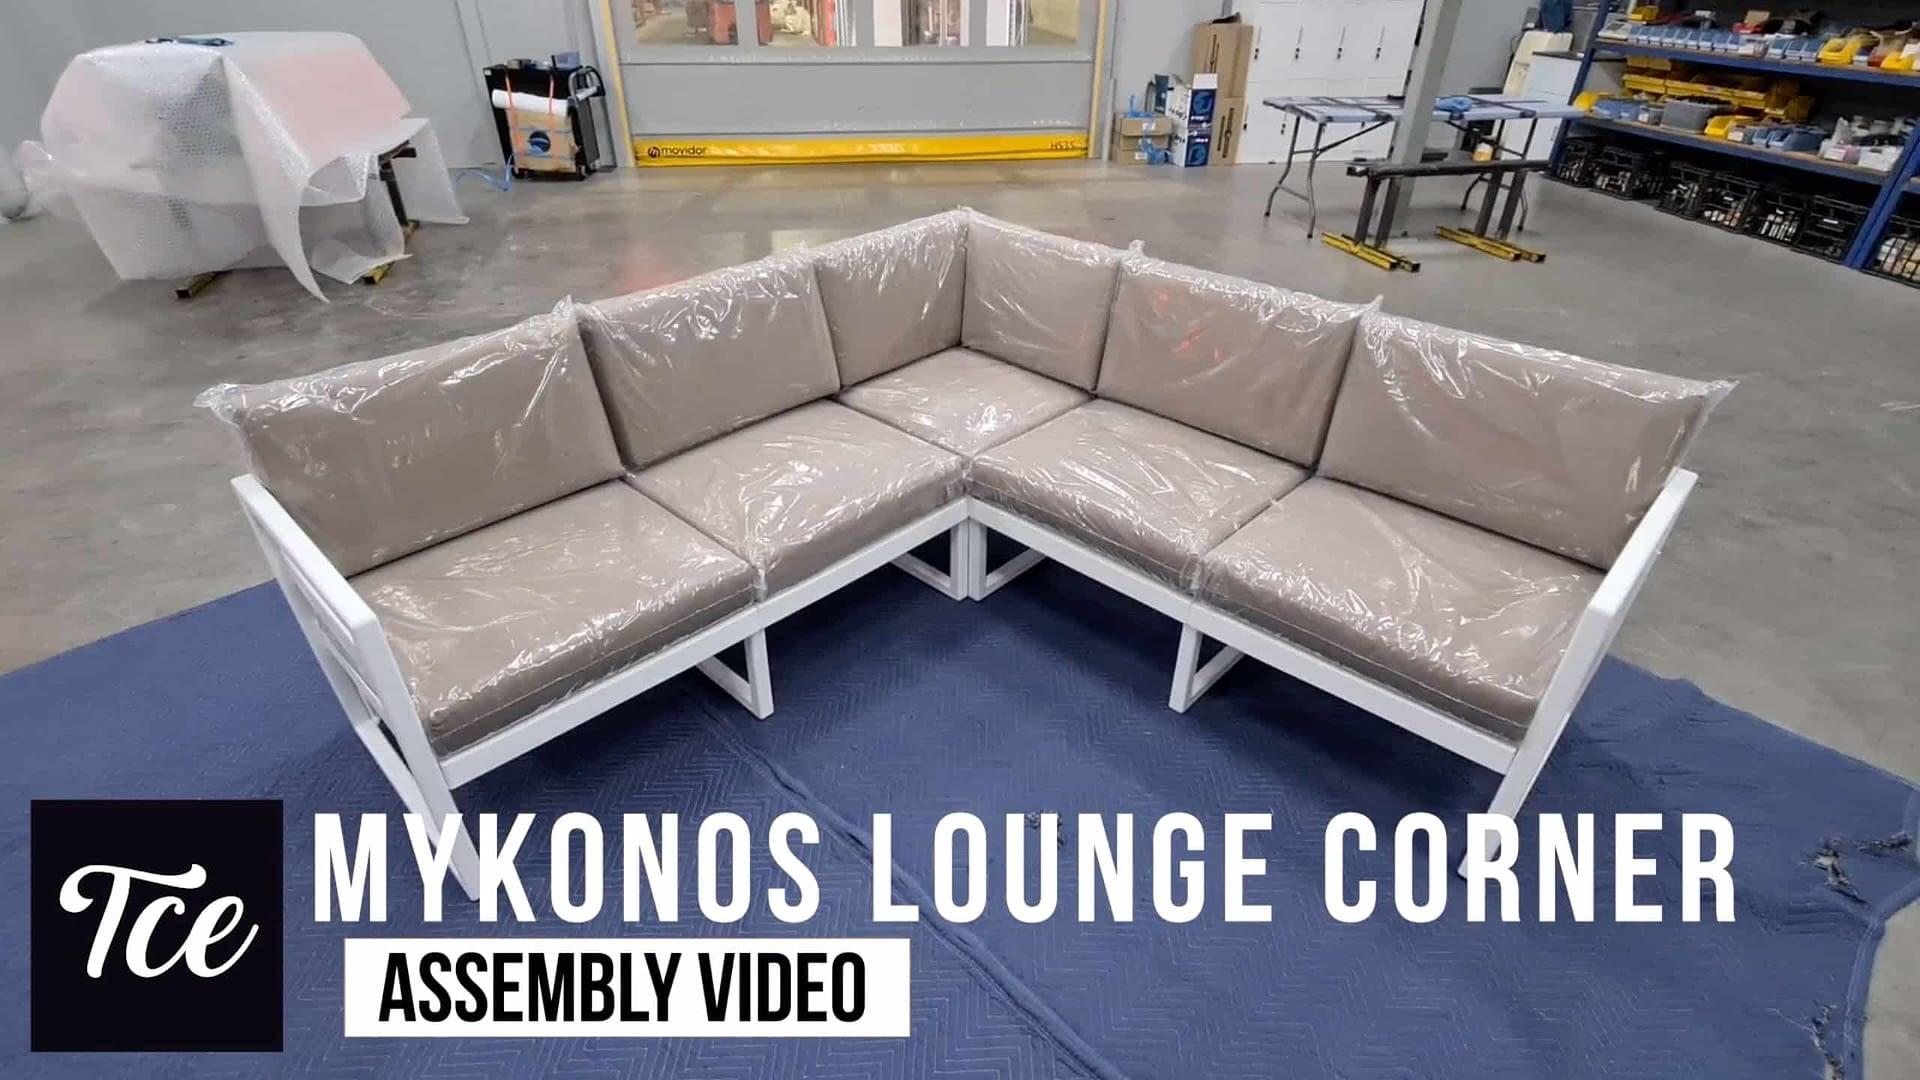 Assembly for the Mykonos Lounge Corner